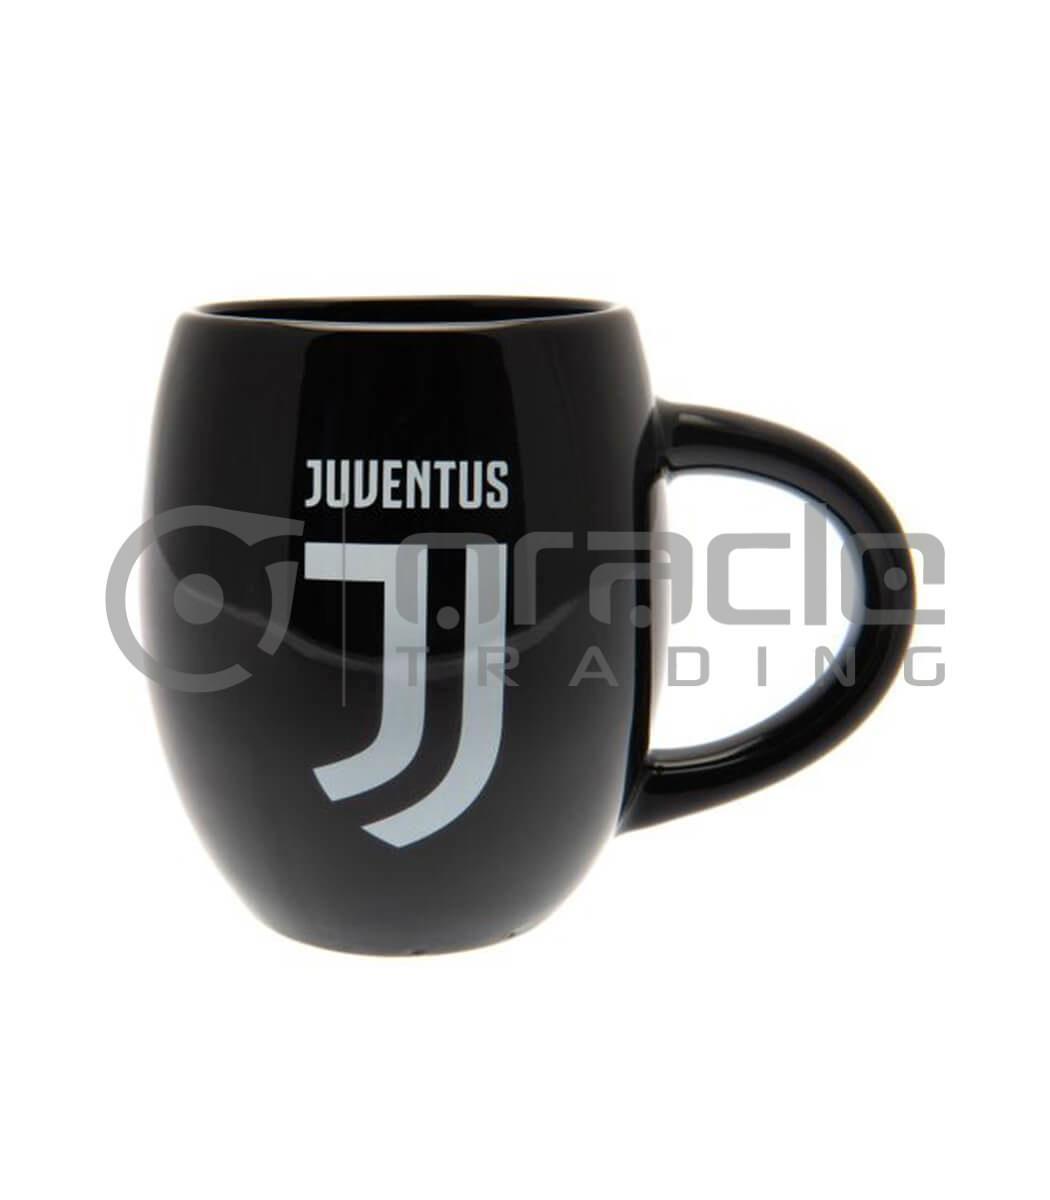 Juventus Tub Mug (Boxed)